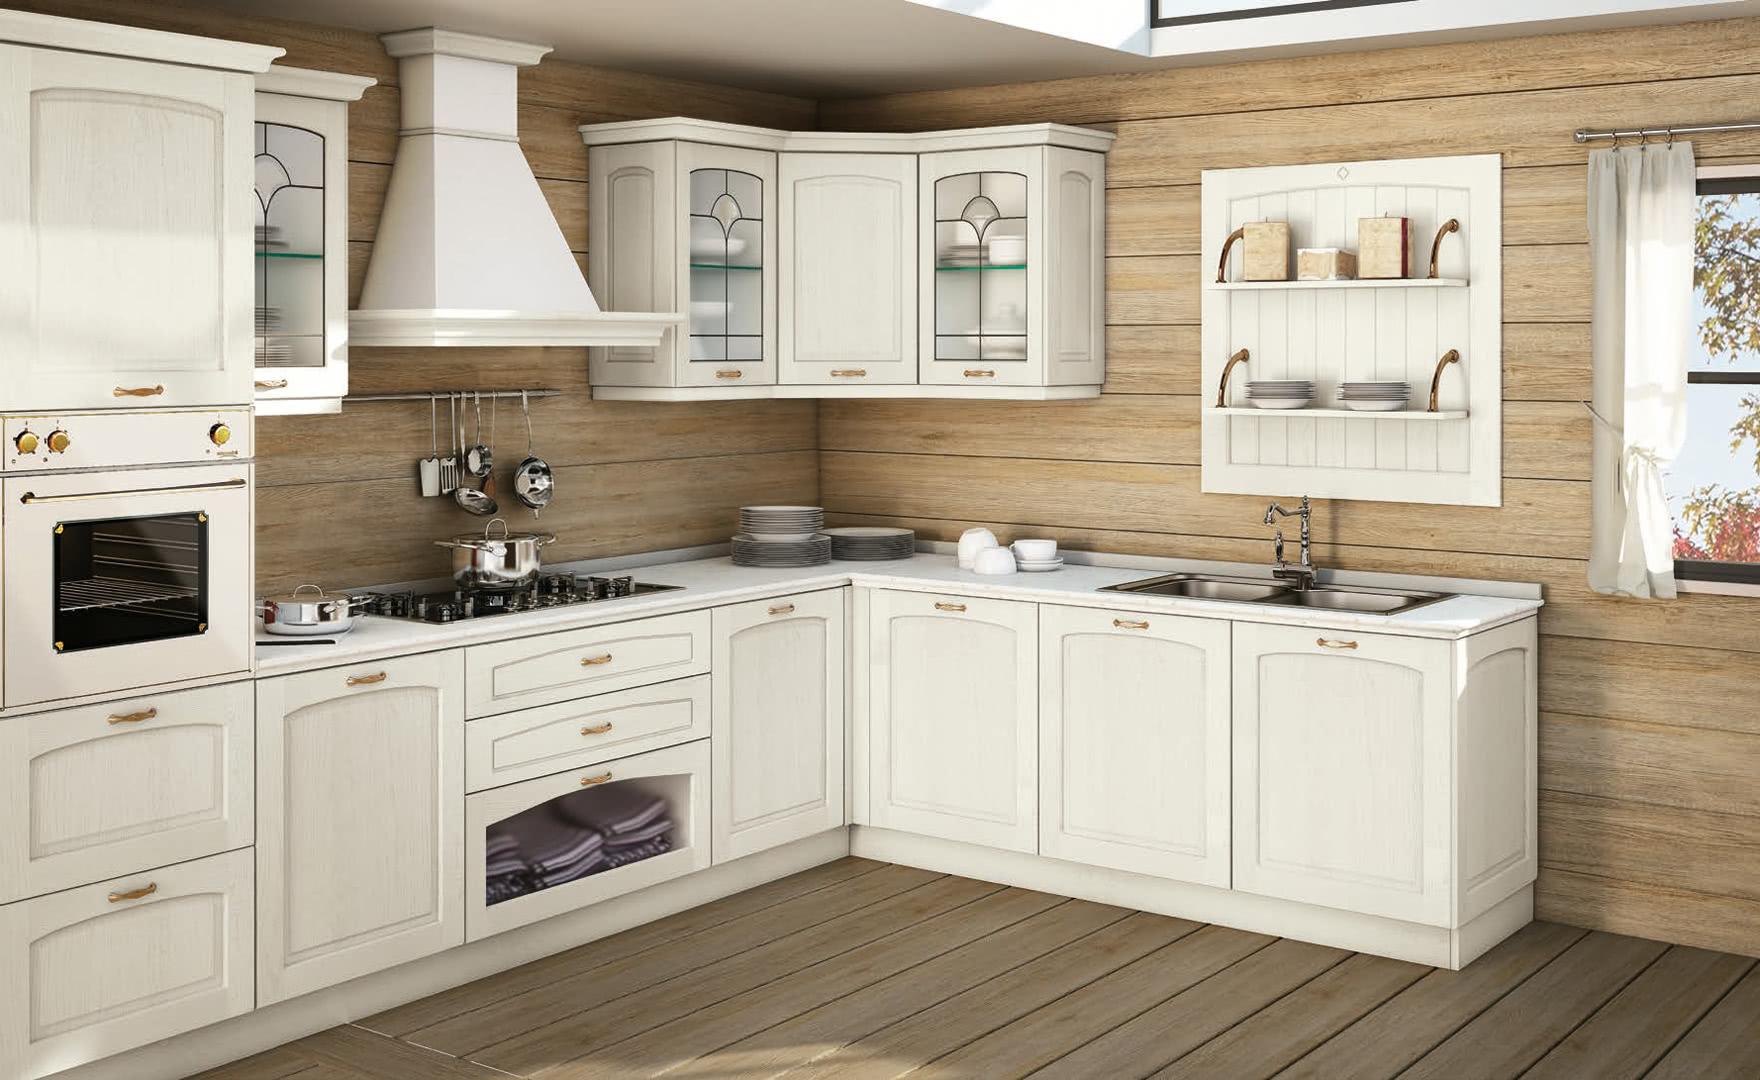 Cucina classica lube malin creo kitchens - Cucine lube creo ...